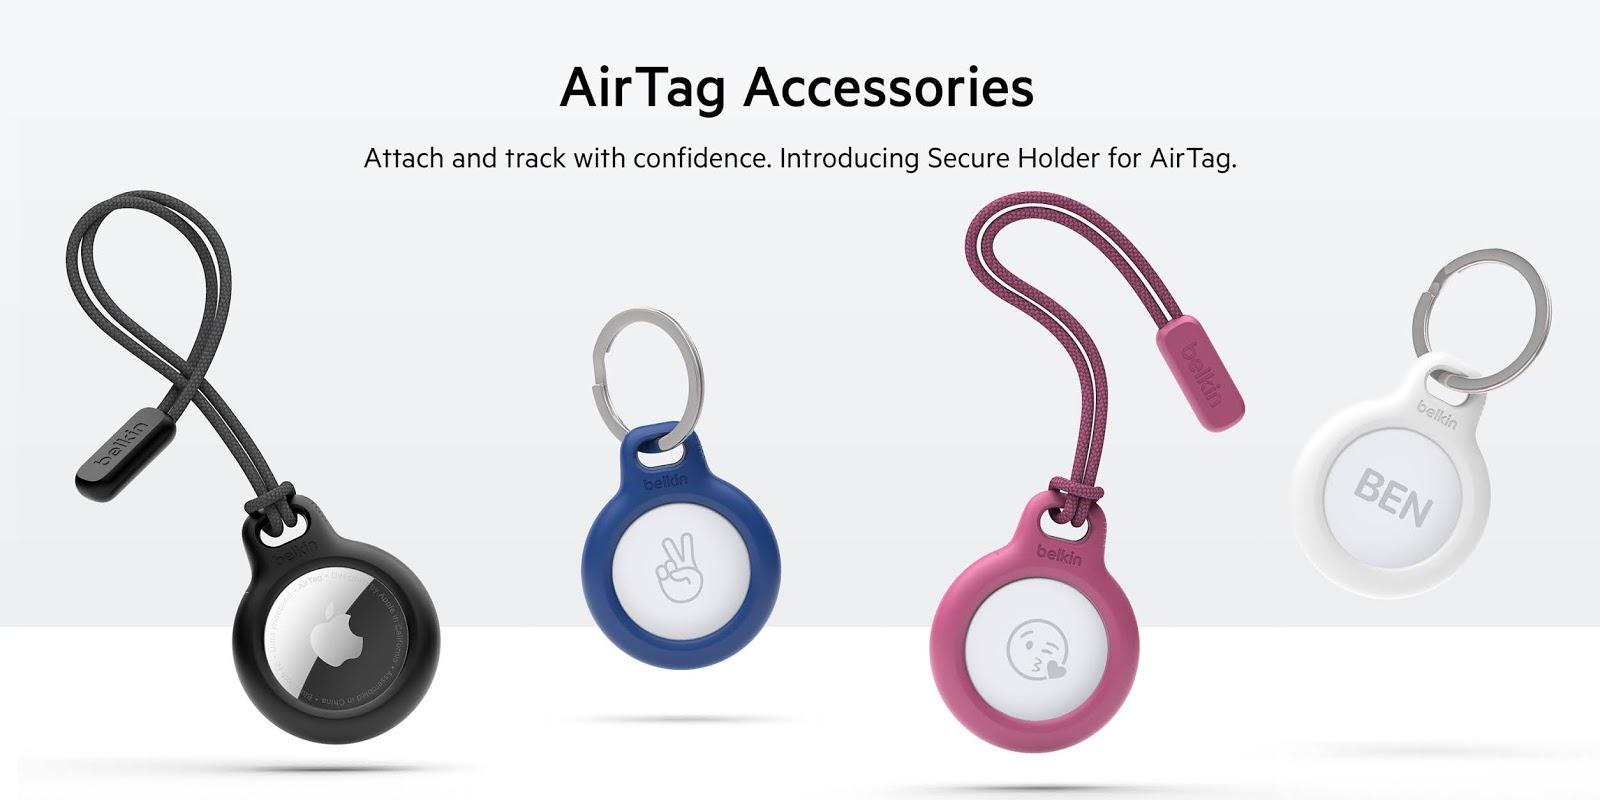 Belkin เปิดตัว Belkin Secure Holder for AirTag เคสสุดคูลเอาใจสาวก Apple สำหรับอุปกรณ์ติดตามสิ่งของ Apple AirTag